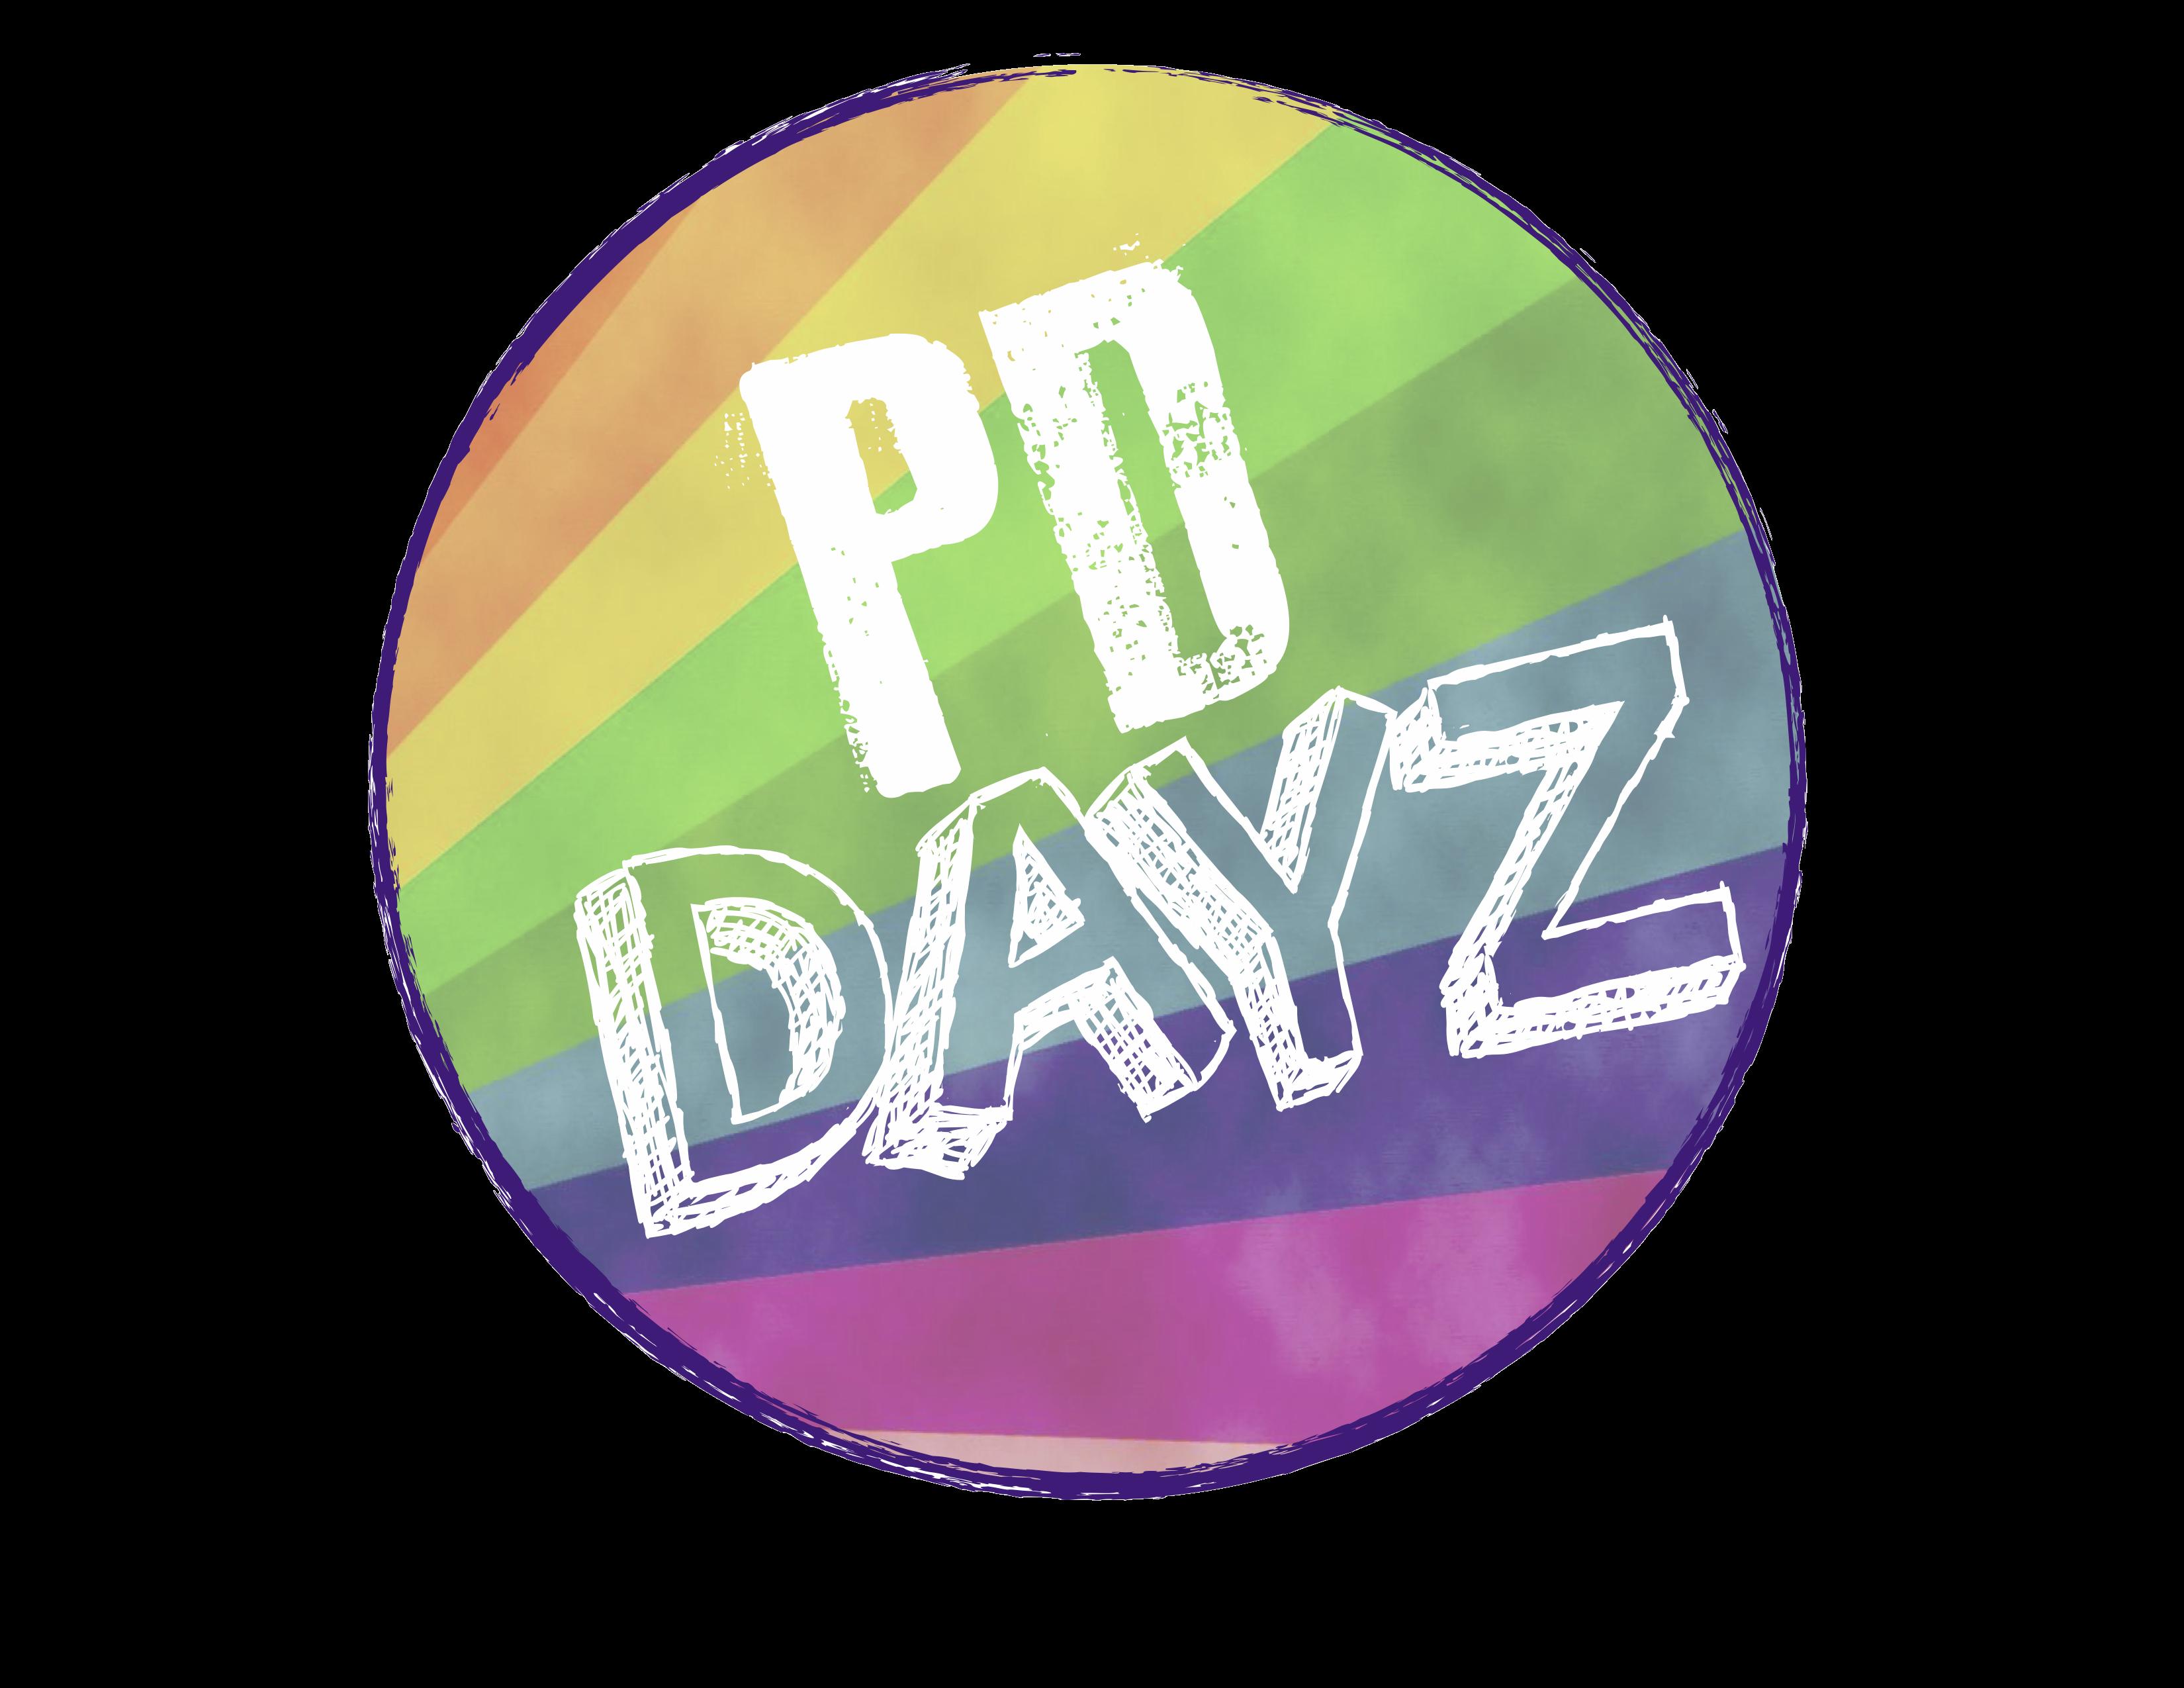 PD DAYZ logo